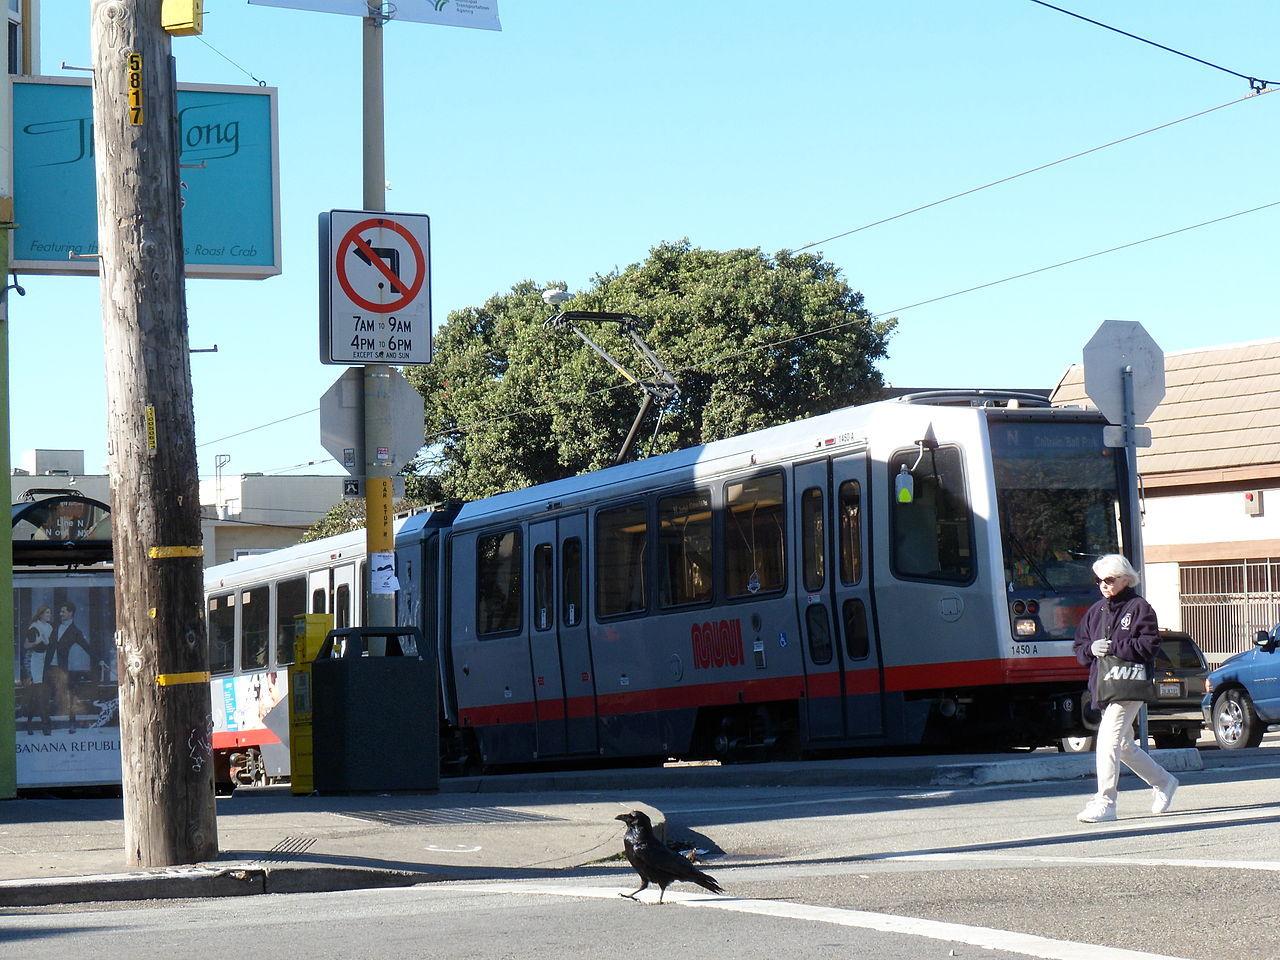 Lokaltrafiken i San Francisco hackad